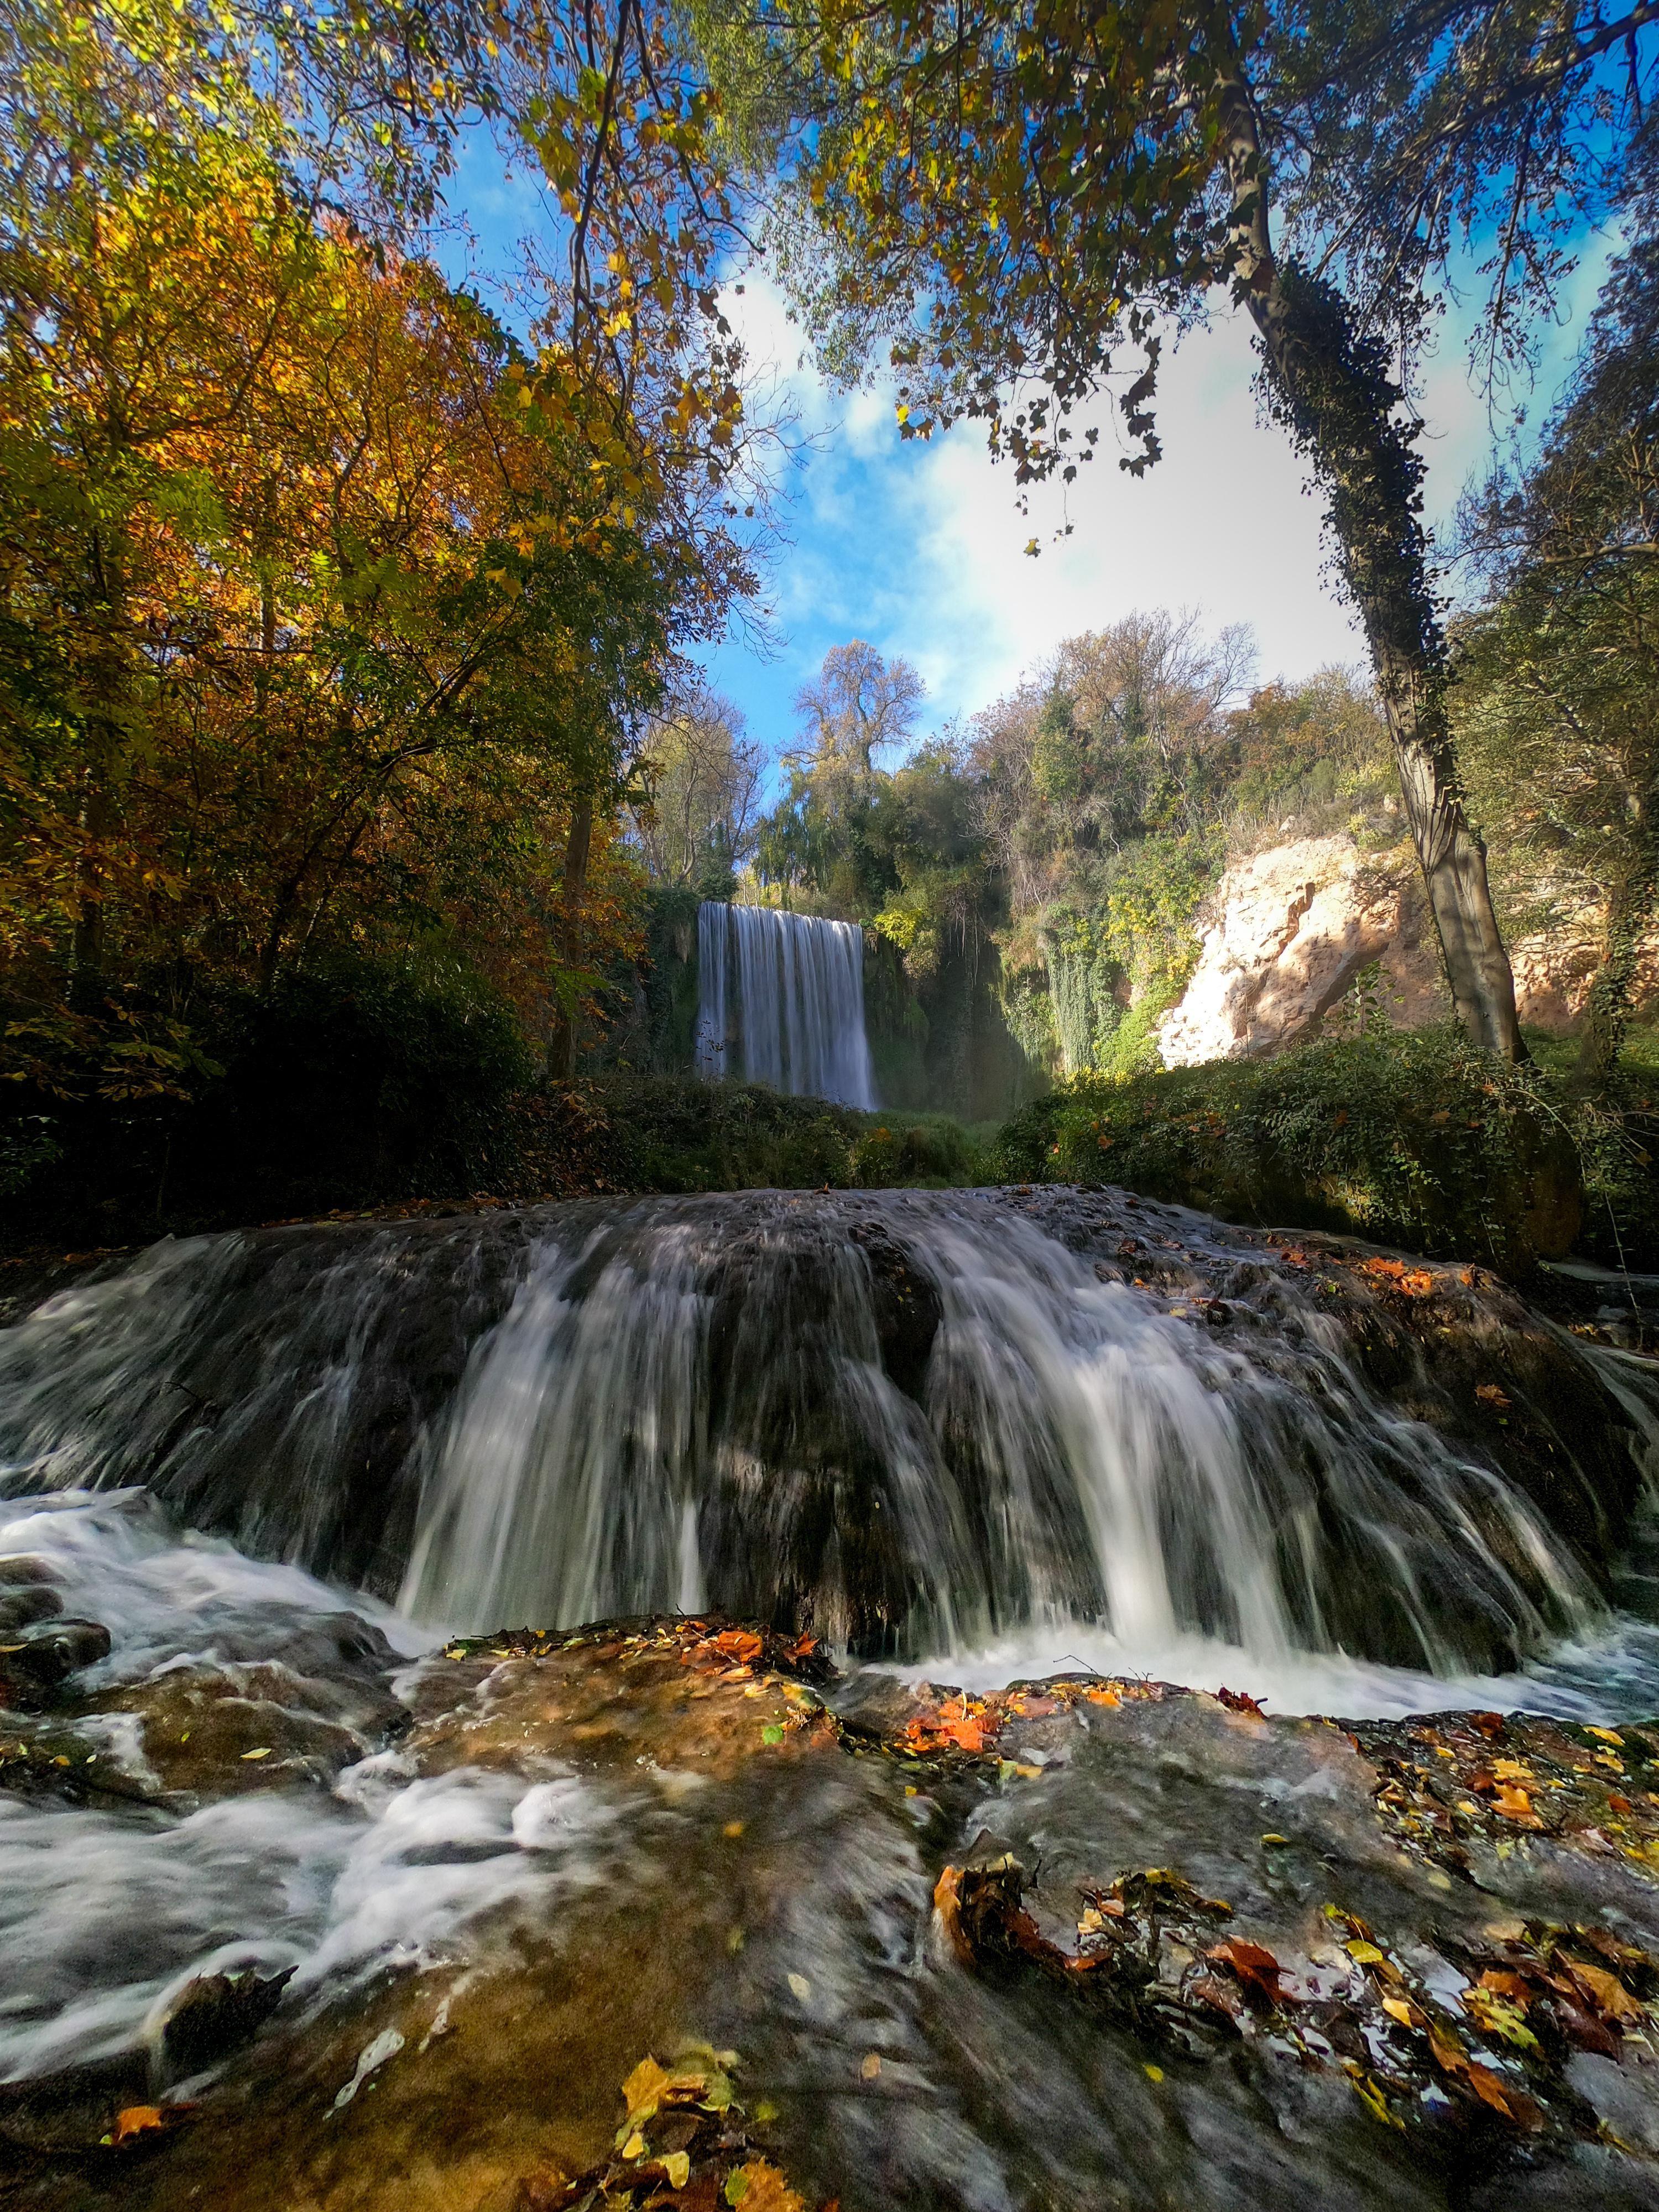 Spanish Autumn Monasterio De Piedra Zaragoza Oc 3000x4000 Music Indieartist Chicago Landscape Photography Landscape Photographers Zaragoza